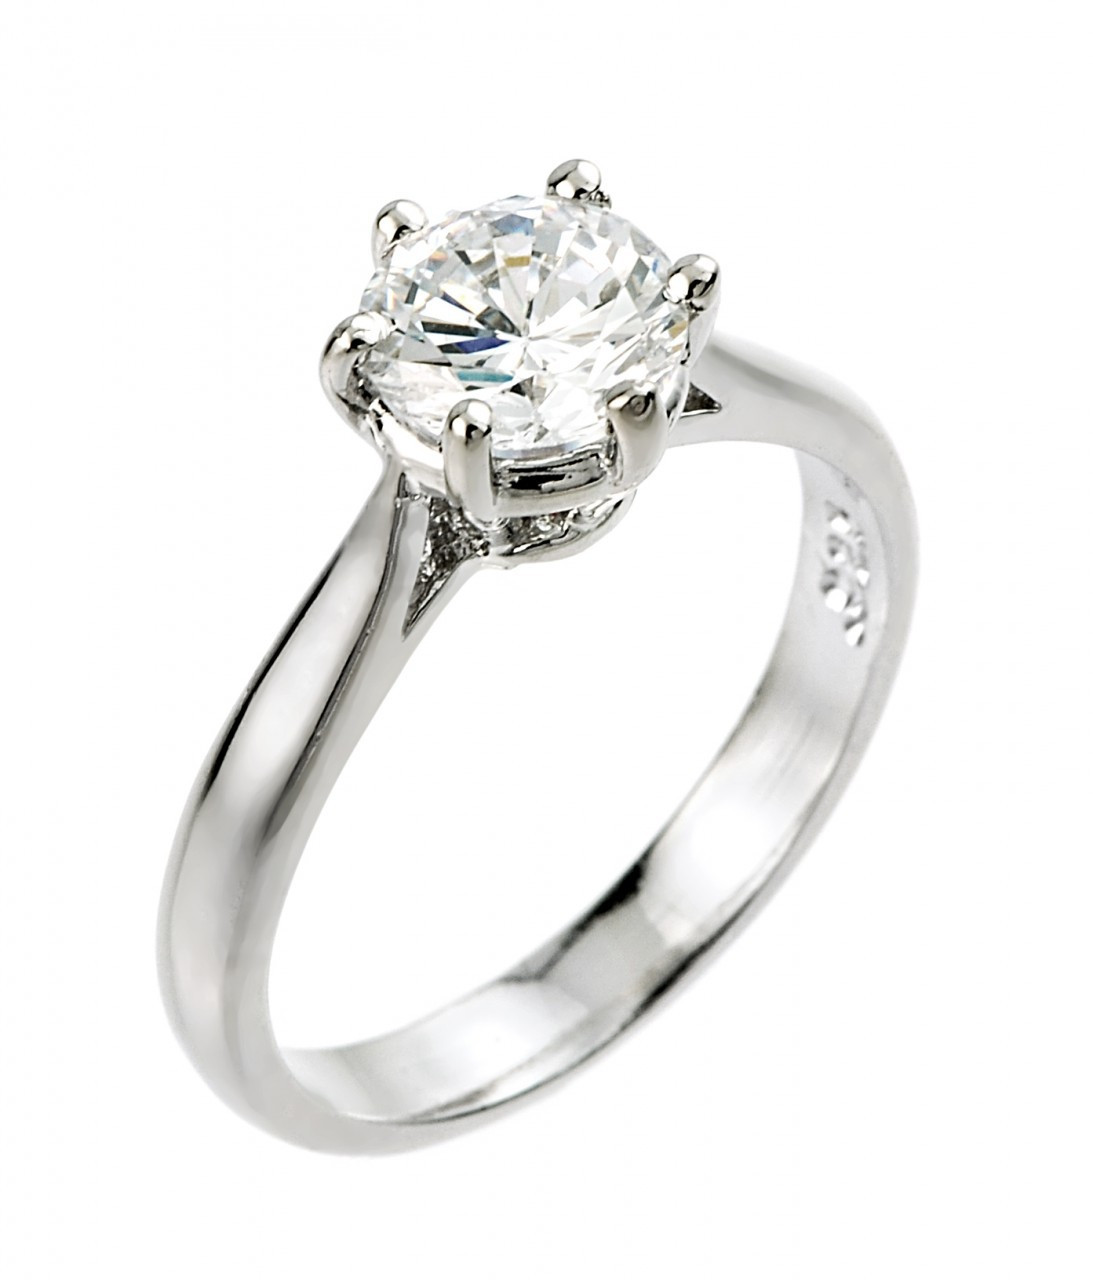 Women 7.5mm 14K White Gold 1.5 Carat Round CZ Solitaire Wedding Engagement Ring